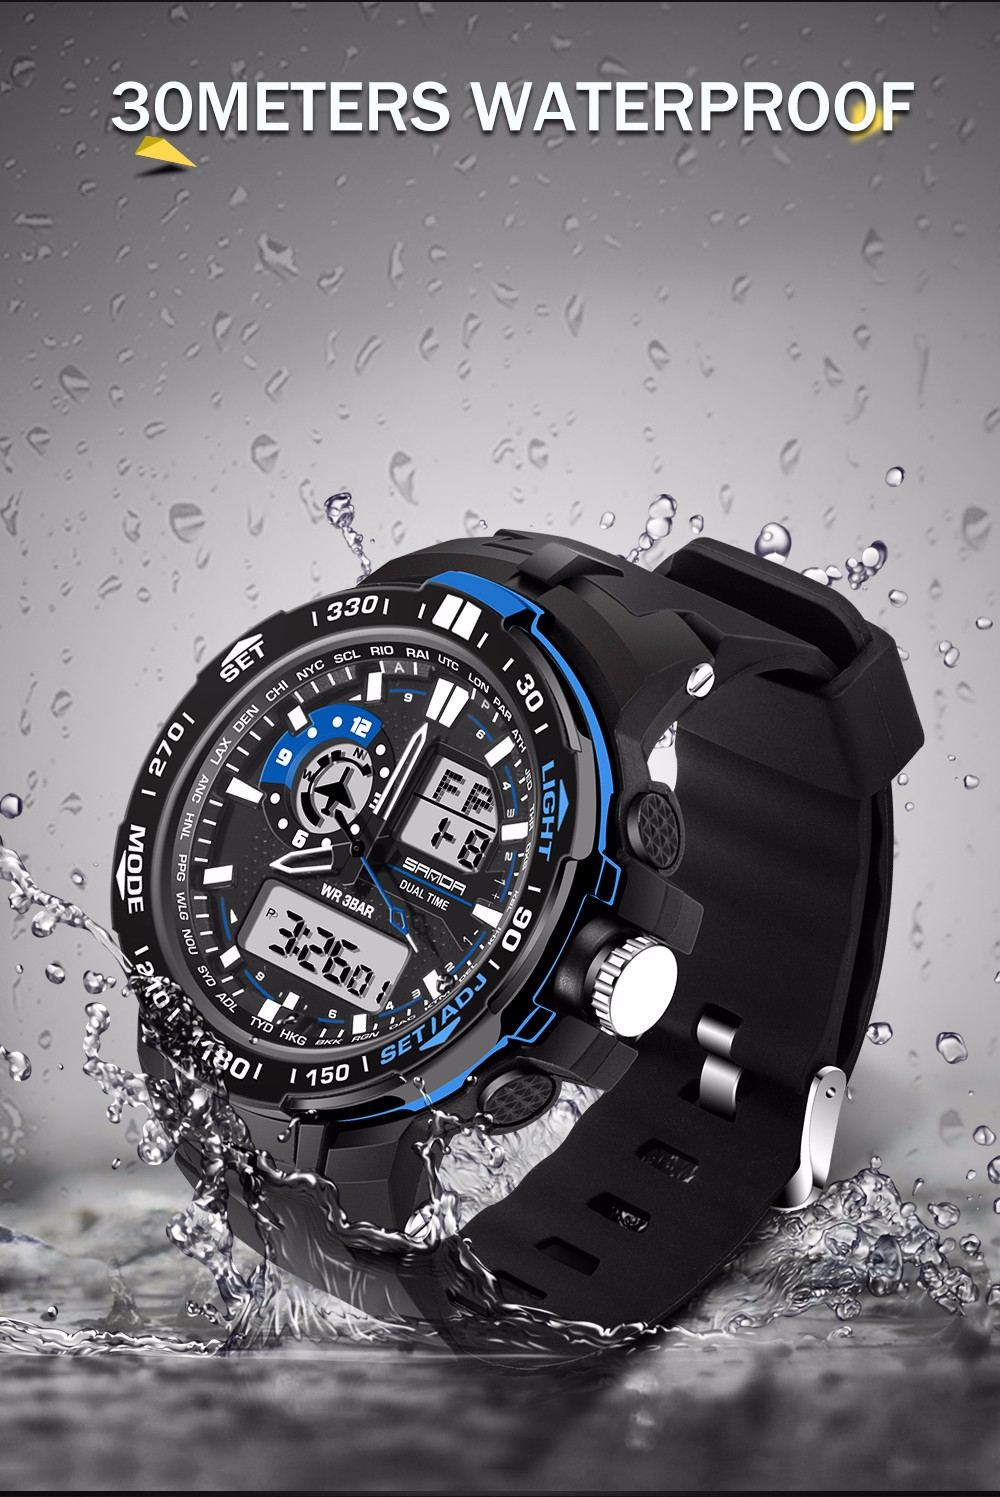 Watch Men Sport Sanda Luxury Brand Fashion Quartz C180 Mopar Fuse Relay Box 3do Not Stay Too Long Time In Water